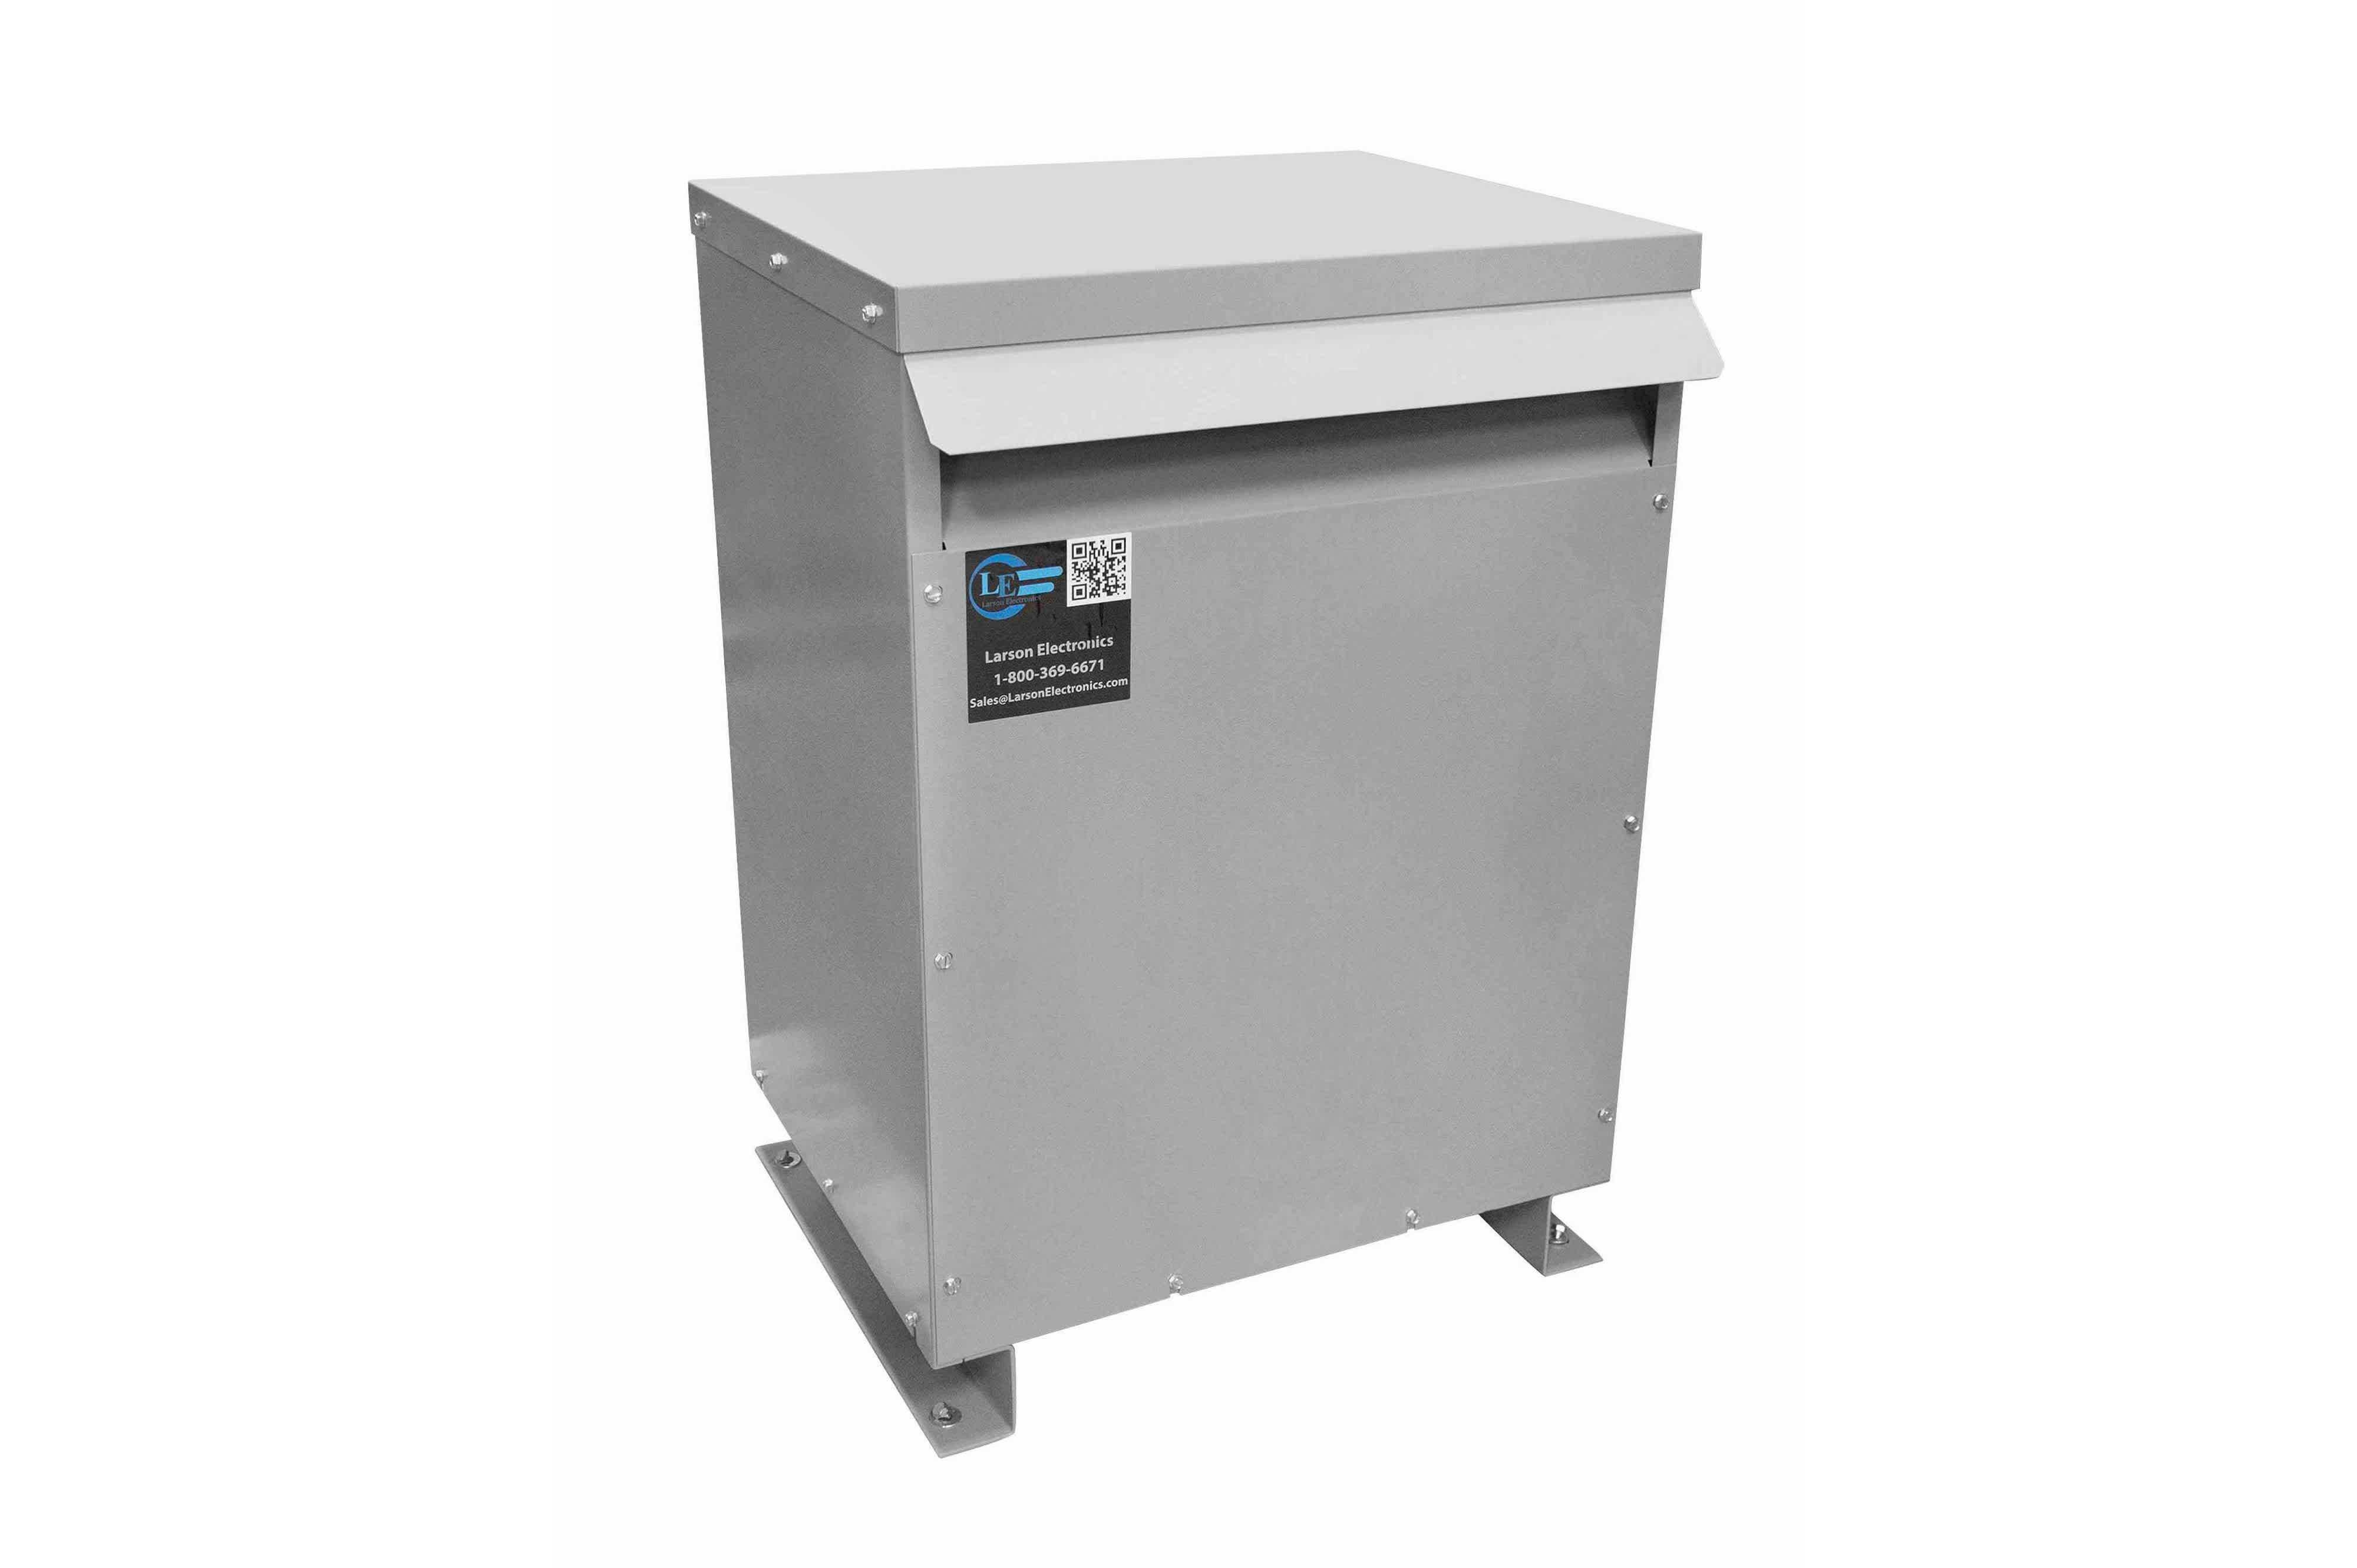 36 kVA 3PH Isolation Transformer, 460V Wye Primary, 600V Delta Secondary, N3R, Ventilated, 60 Hz